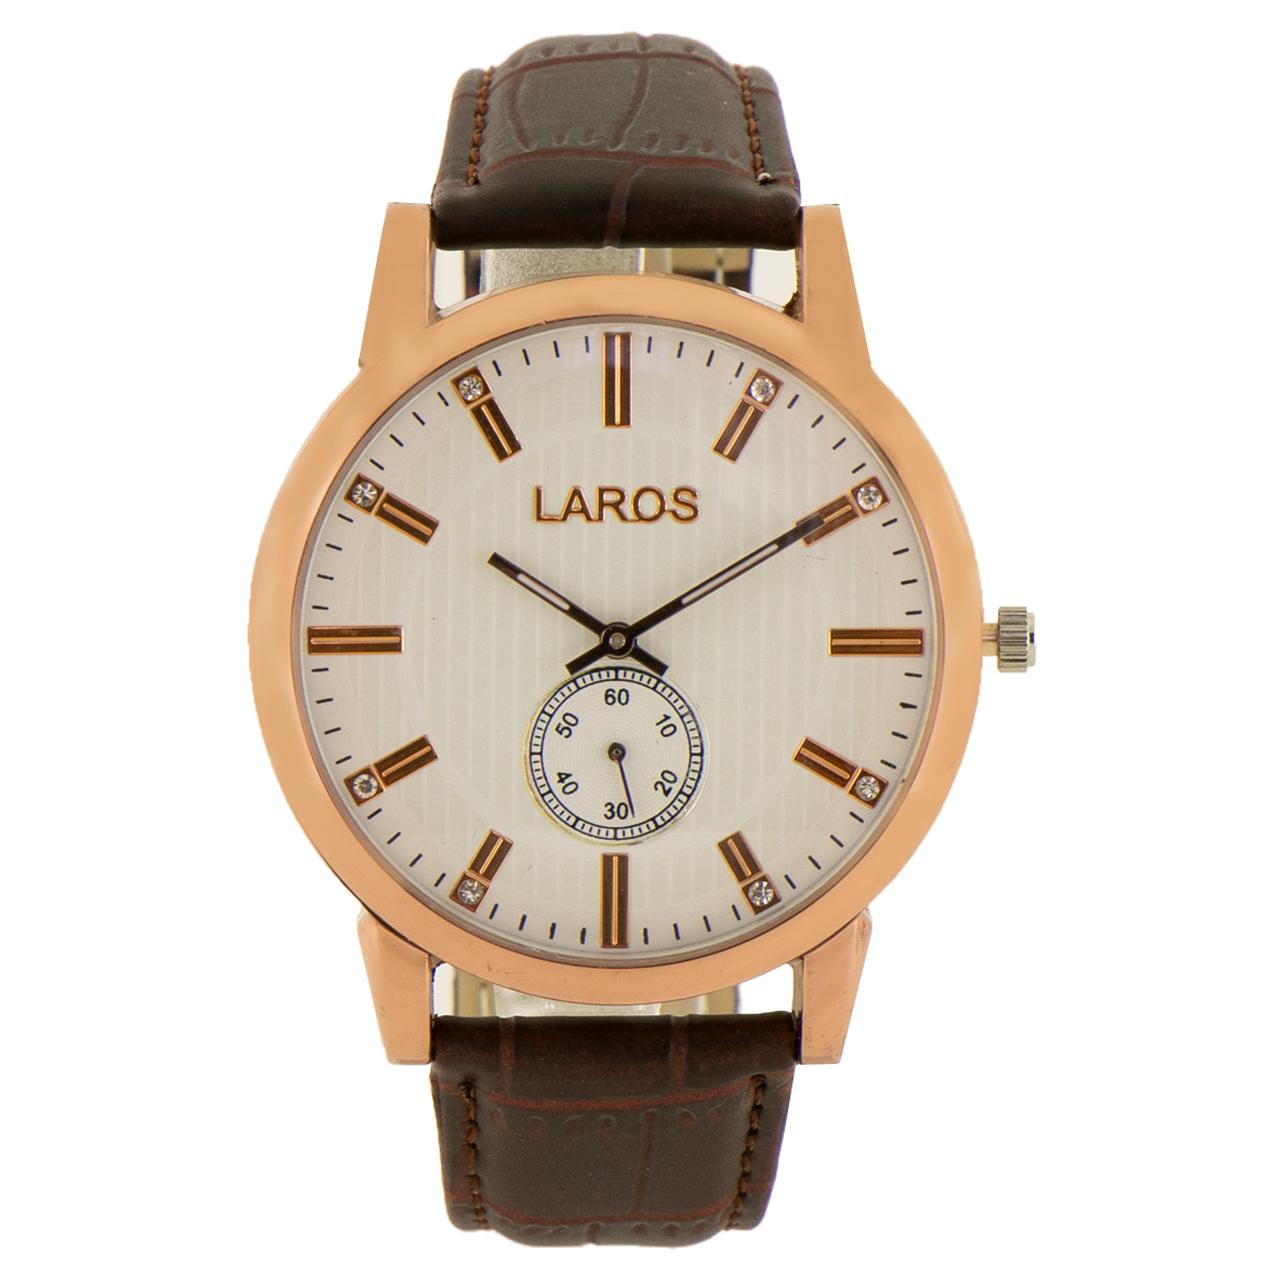 ساعت  لاروس مدل LA 2021